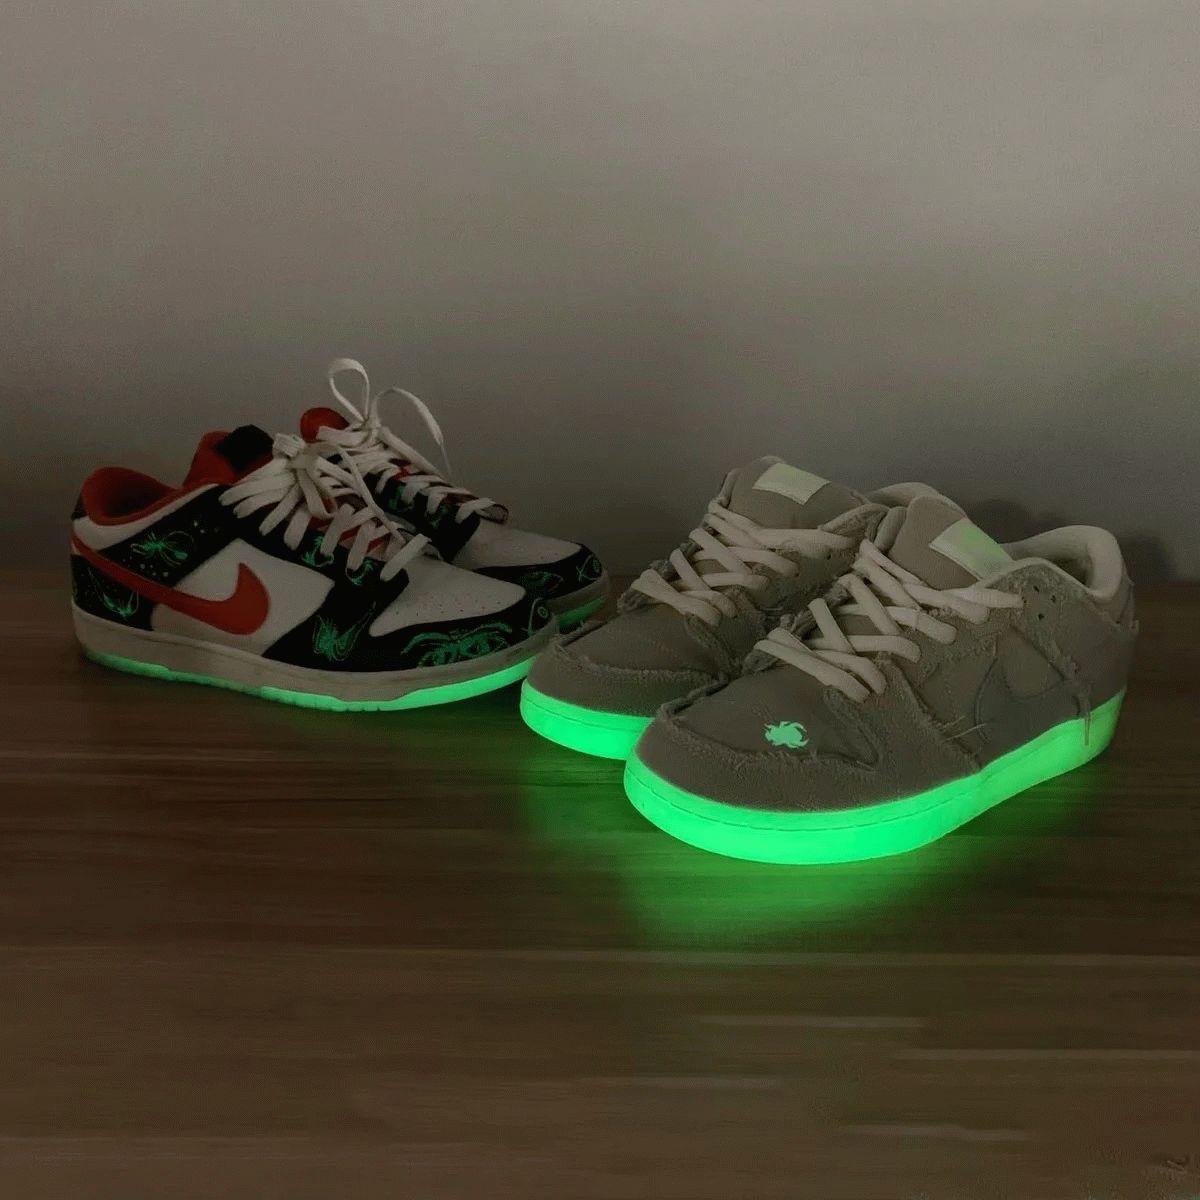 Spooky Nike SB Dunk Low Mummy glow in the dark